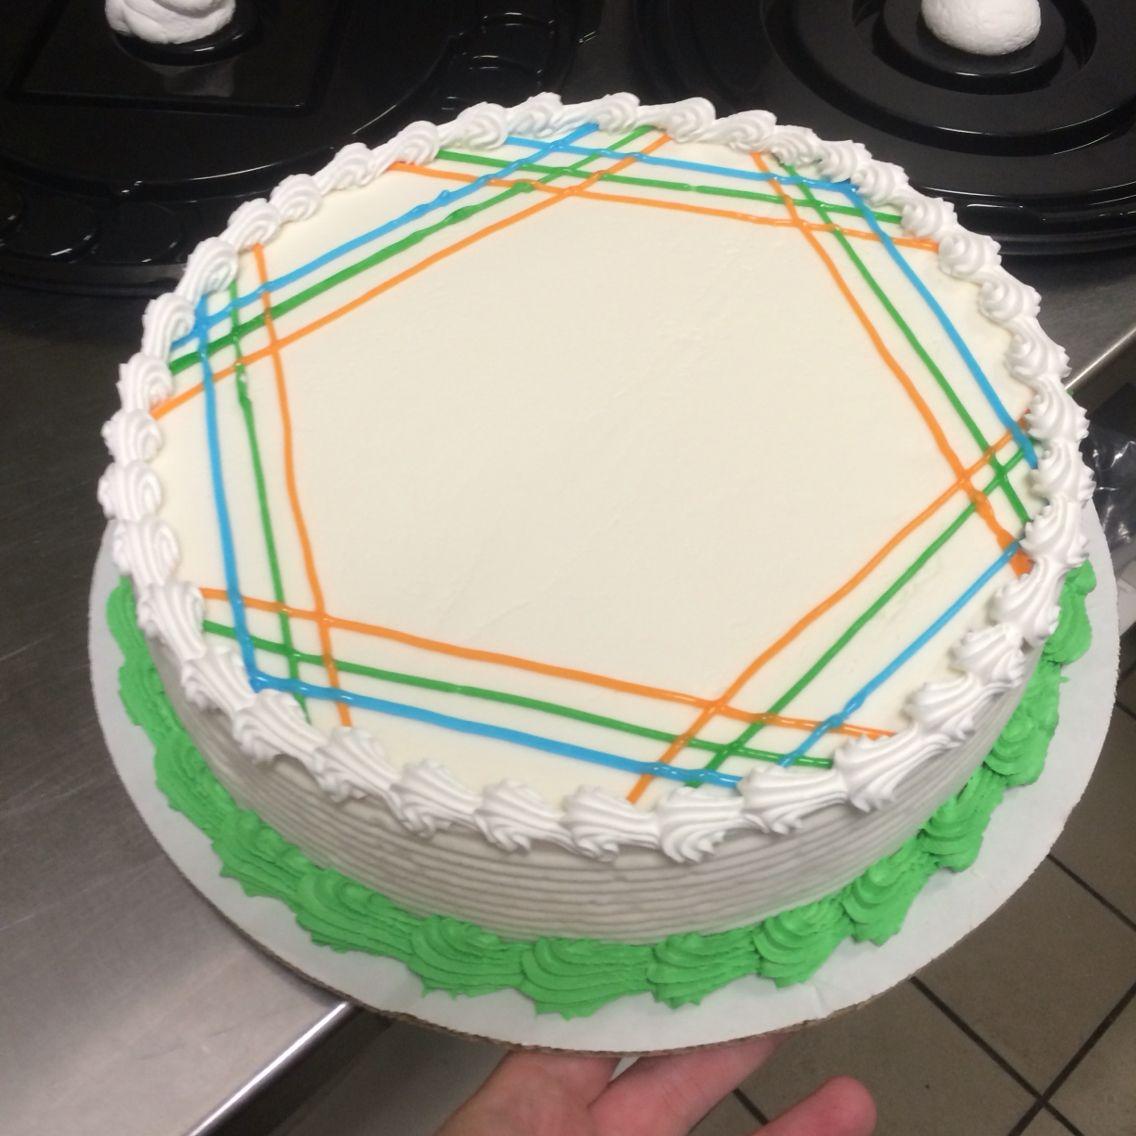 Dq cake design hexagon look dairy queen ice cream cake